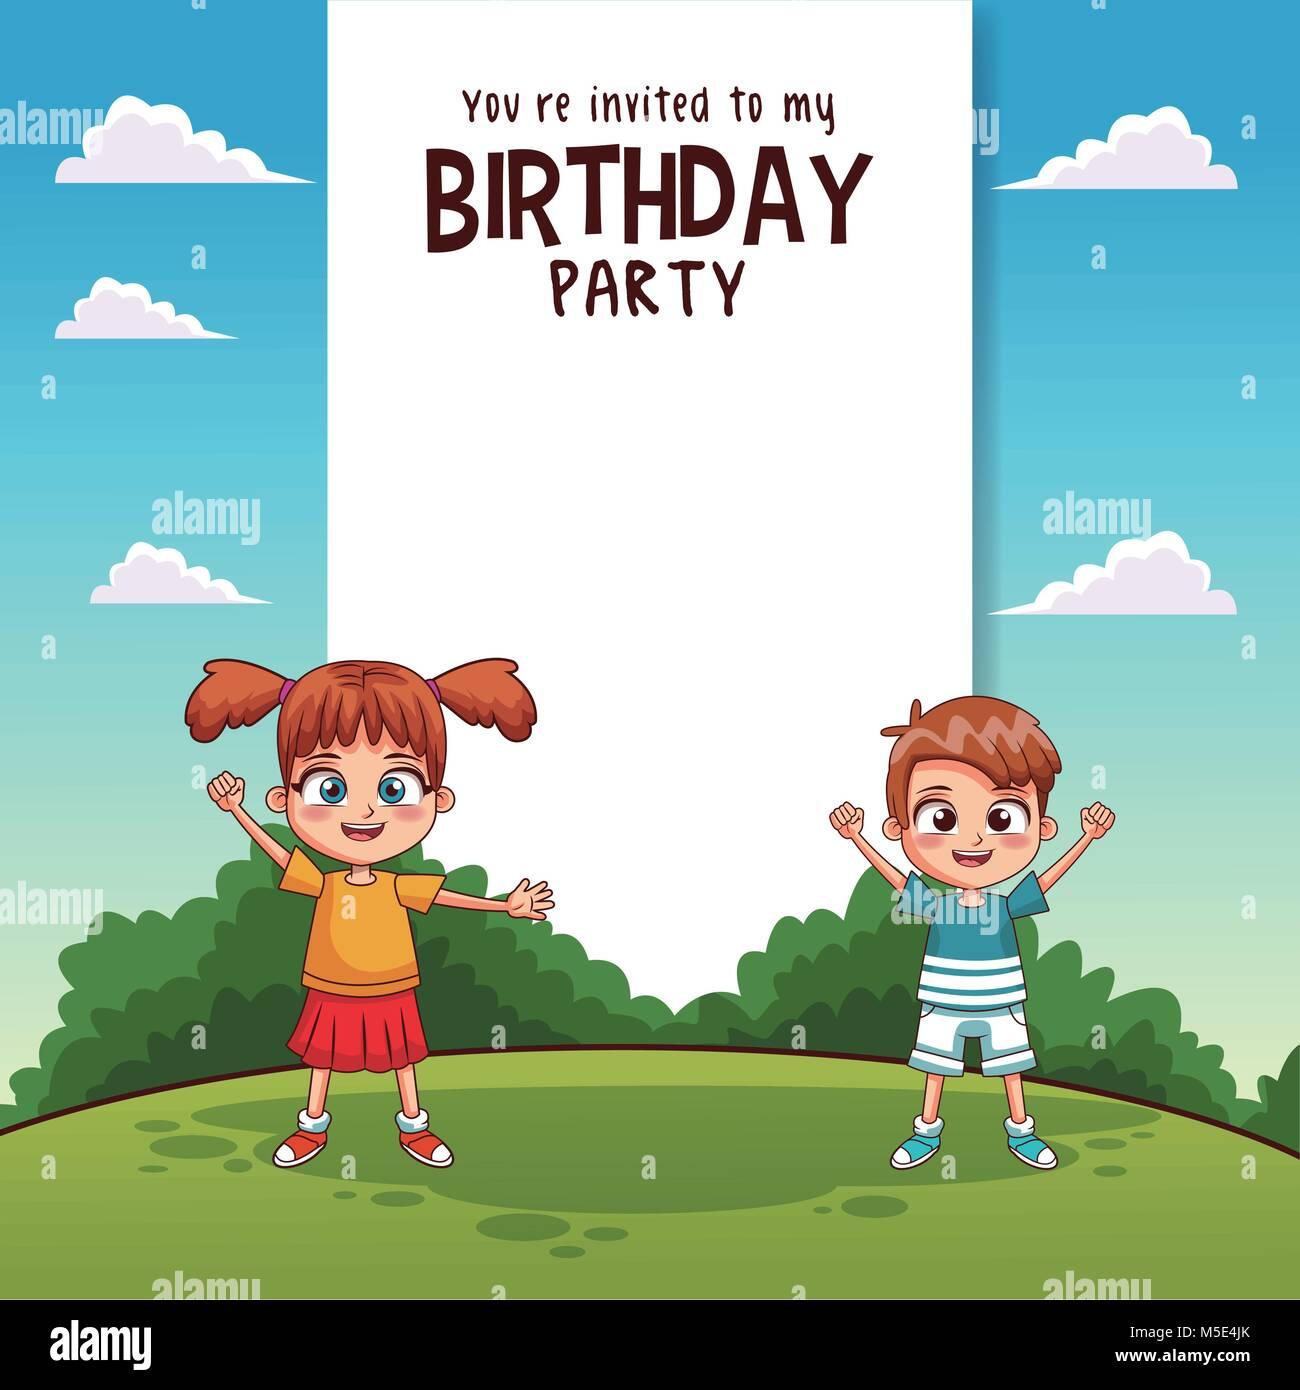 Kids Birthday Party Card Invitation